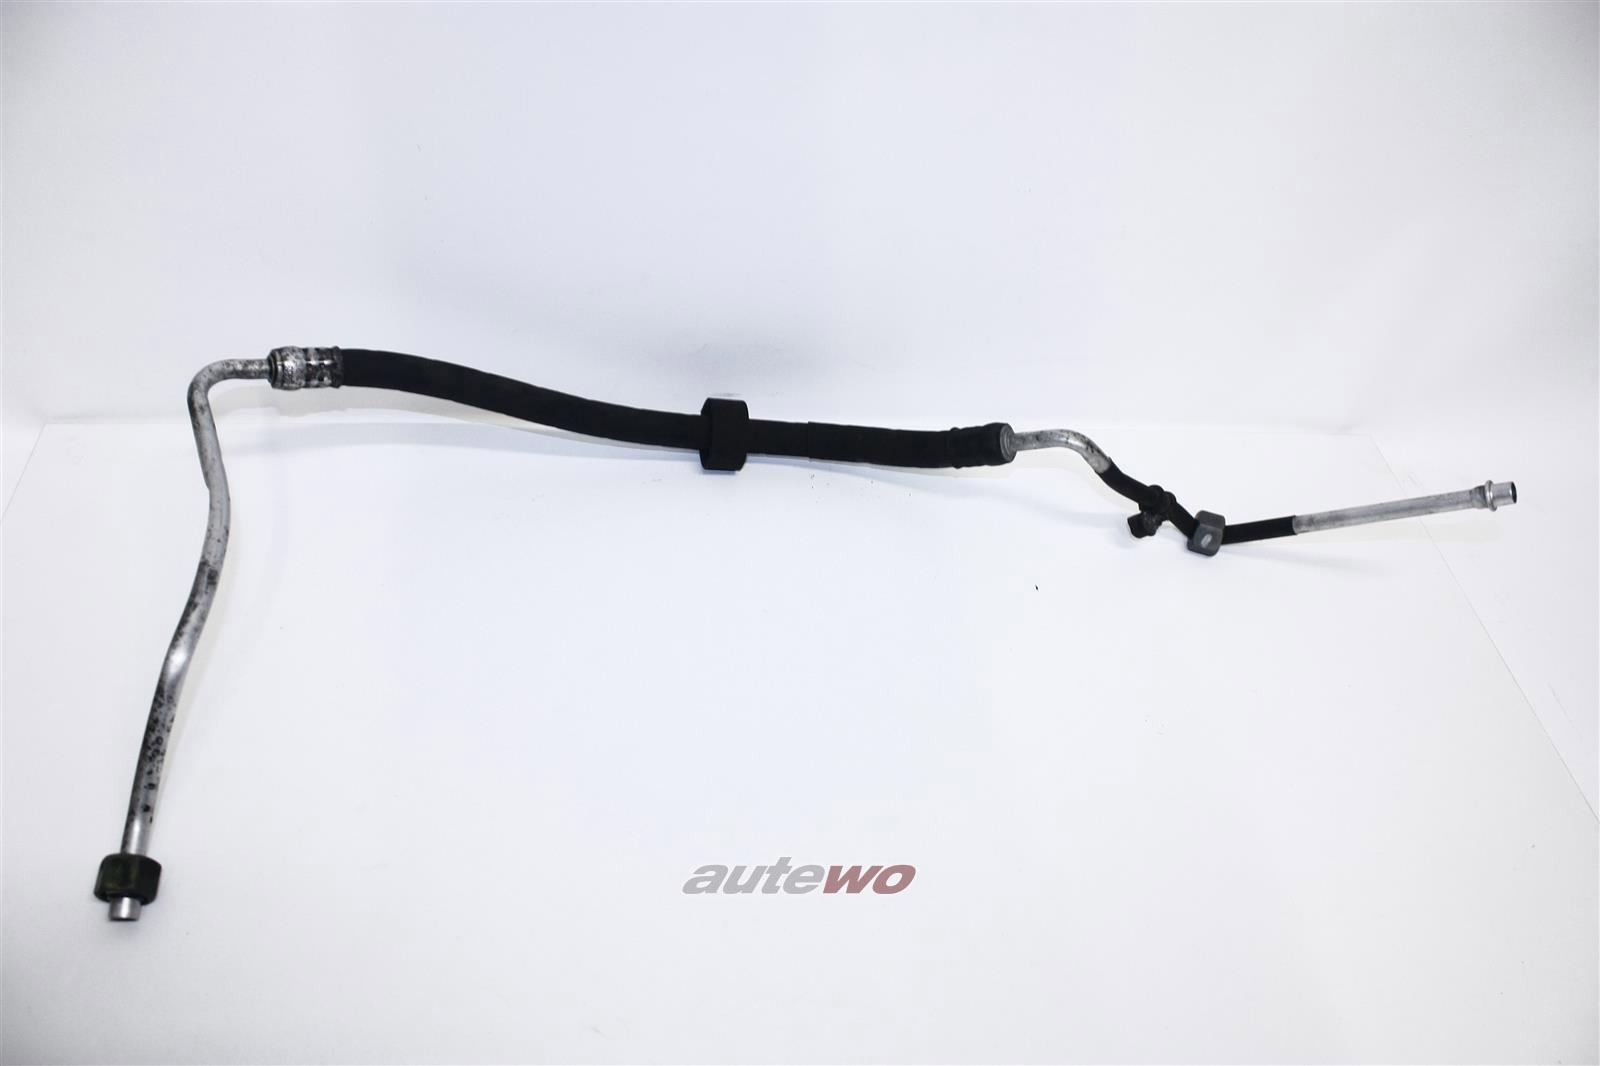 Audi V8 D11 3.6-4.2l Klima Kältemittelschlauch Kondens. > T-Stück 441260709G